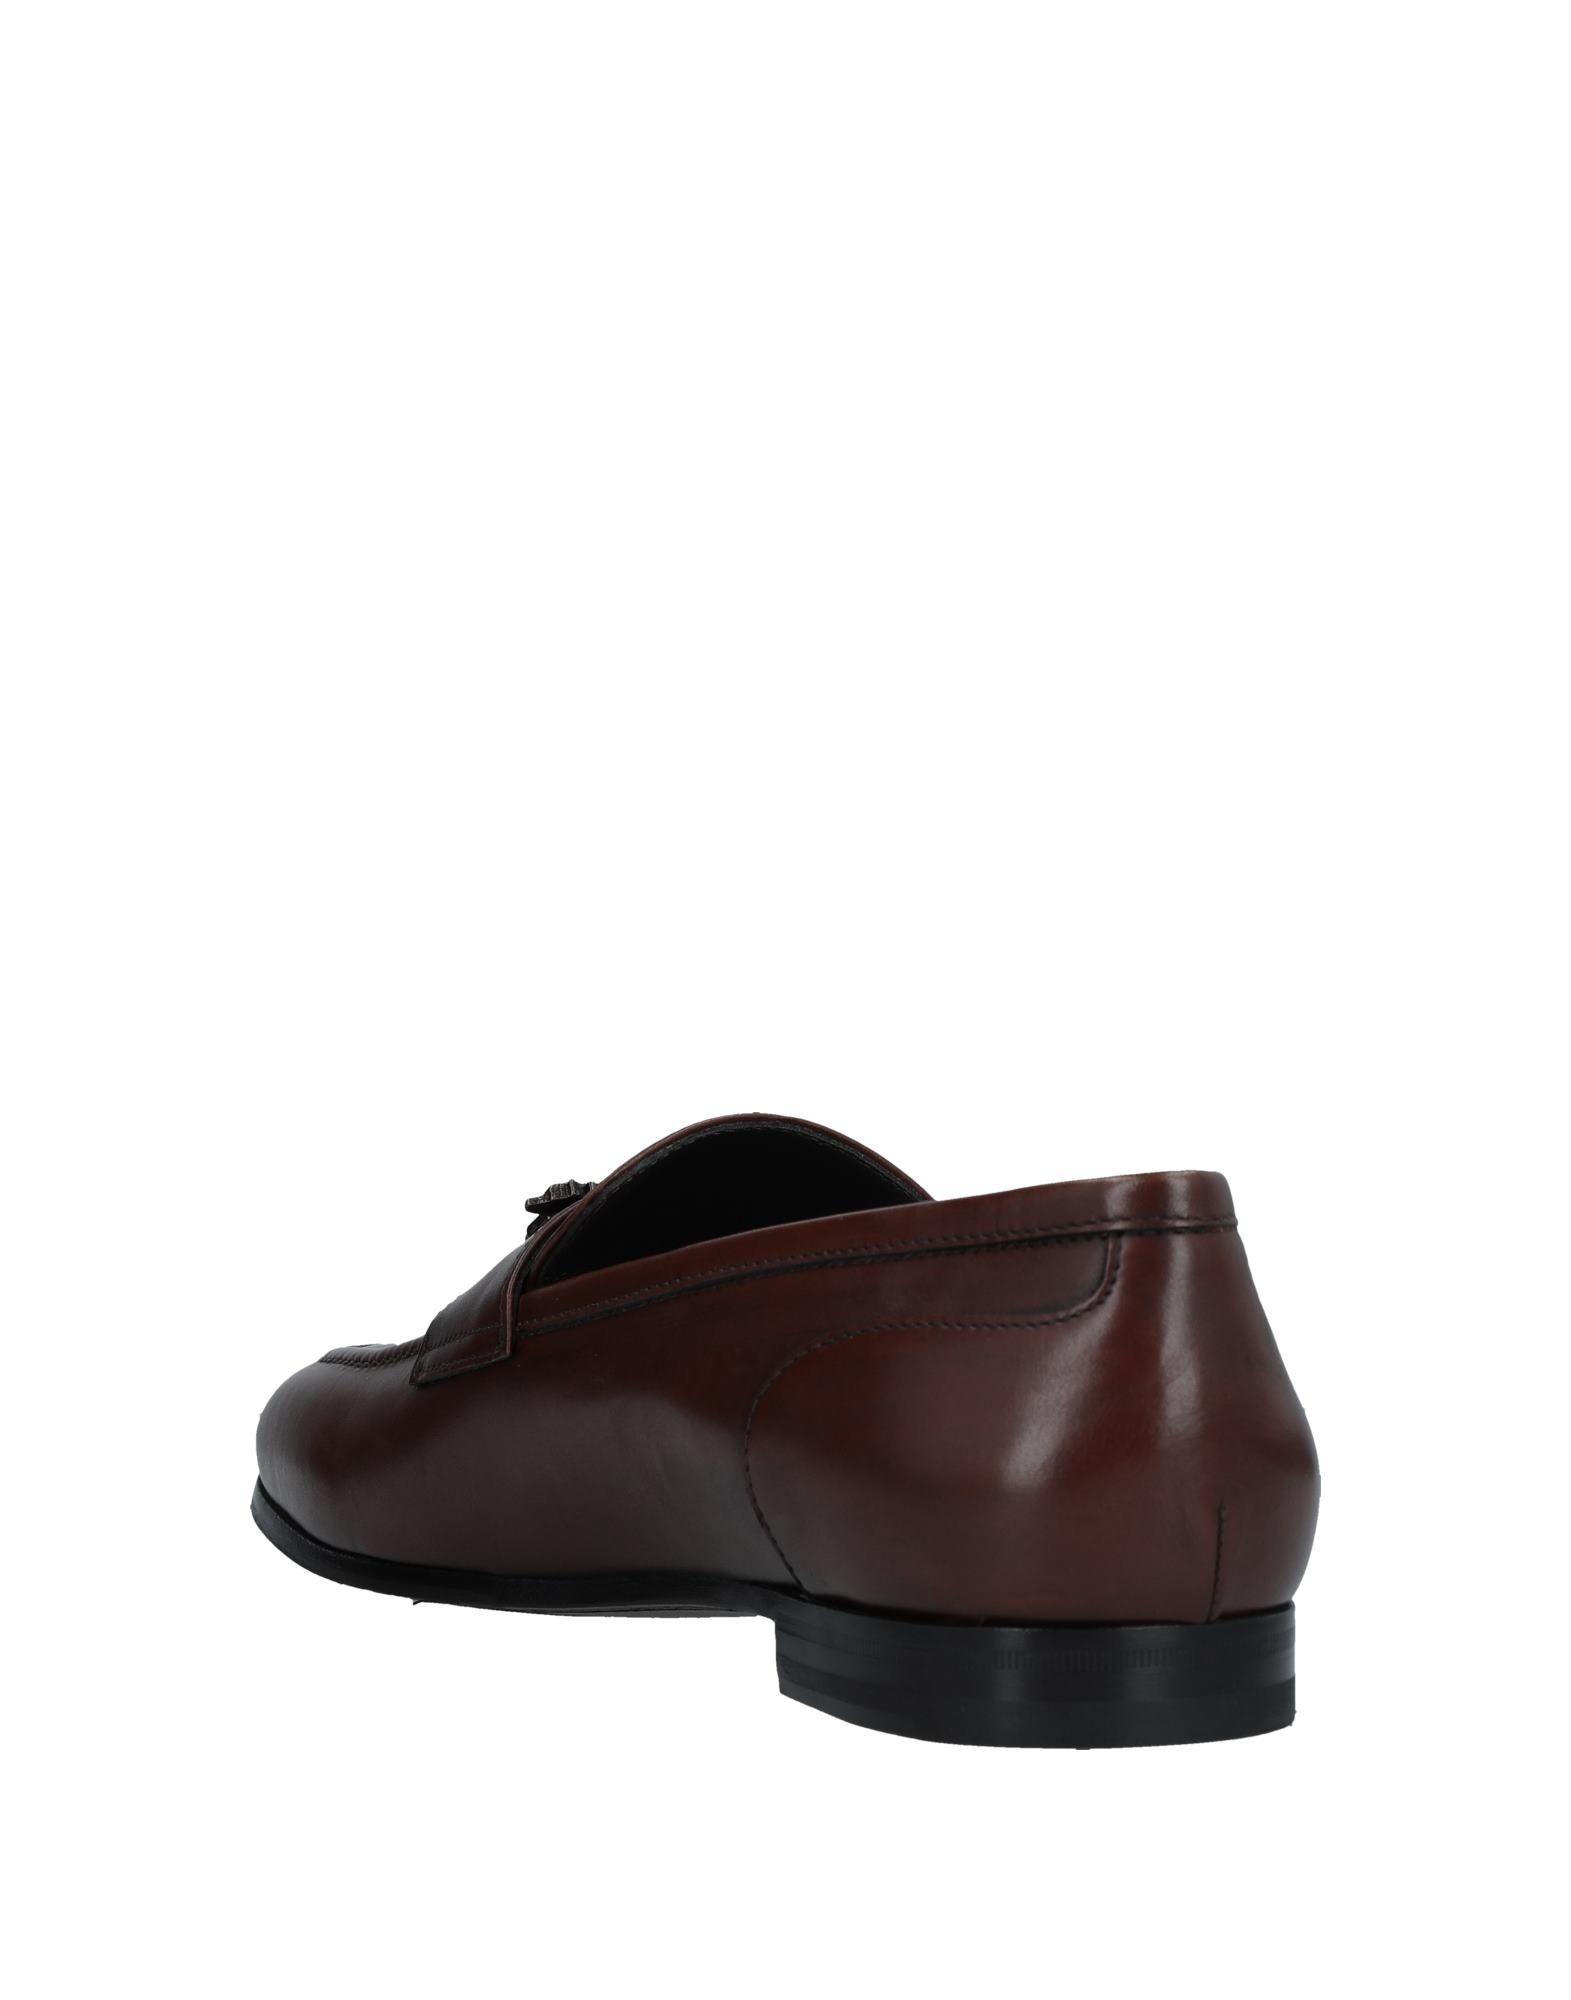 Dsquared2 Gute Mokassins Herren  11535678EA Gute Dsquared2 Qualität beliebte Schuhe 9db689